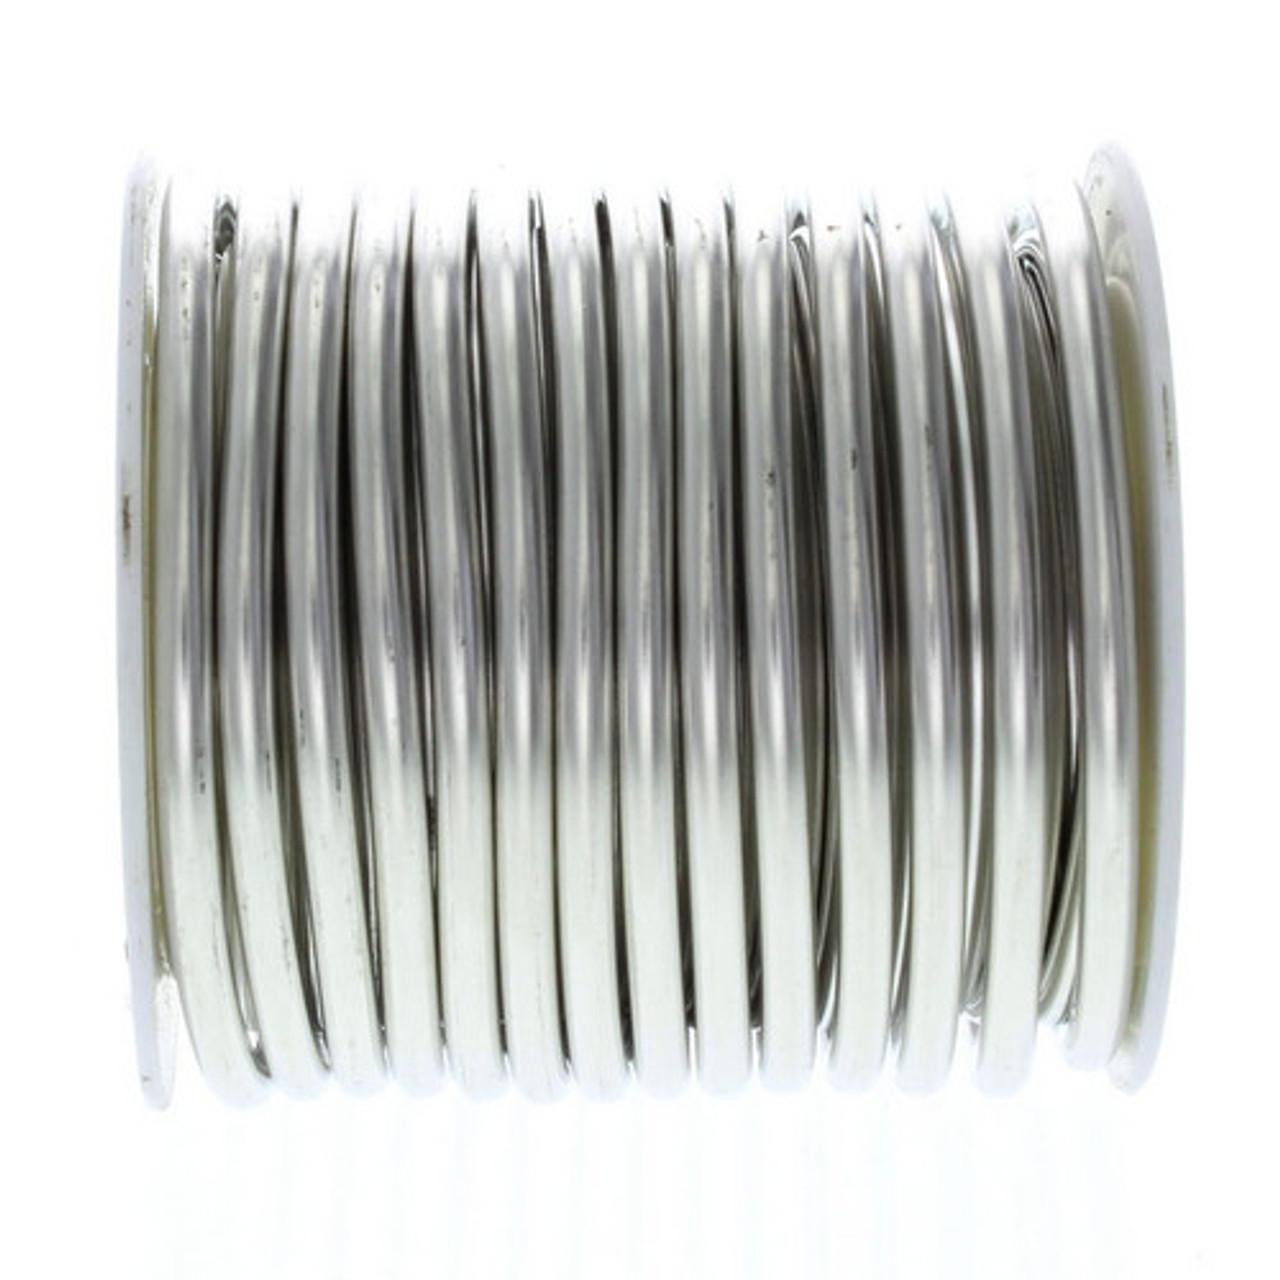 "Super 50 Lead Free Wire Solder 1 lb Spool 1/8"" .125 Dia. Free Shipping"